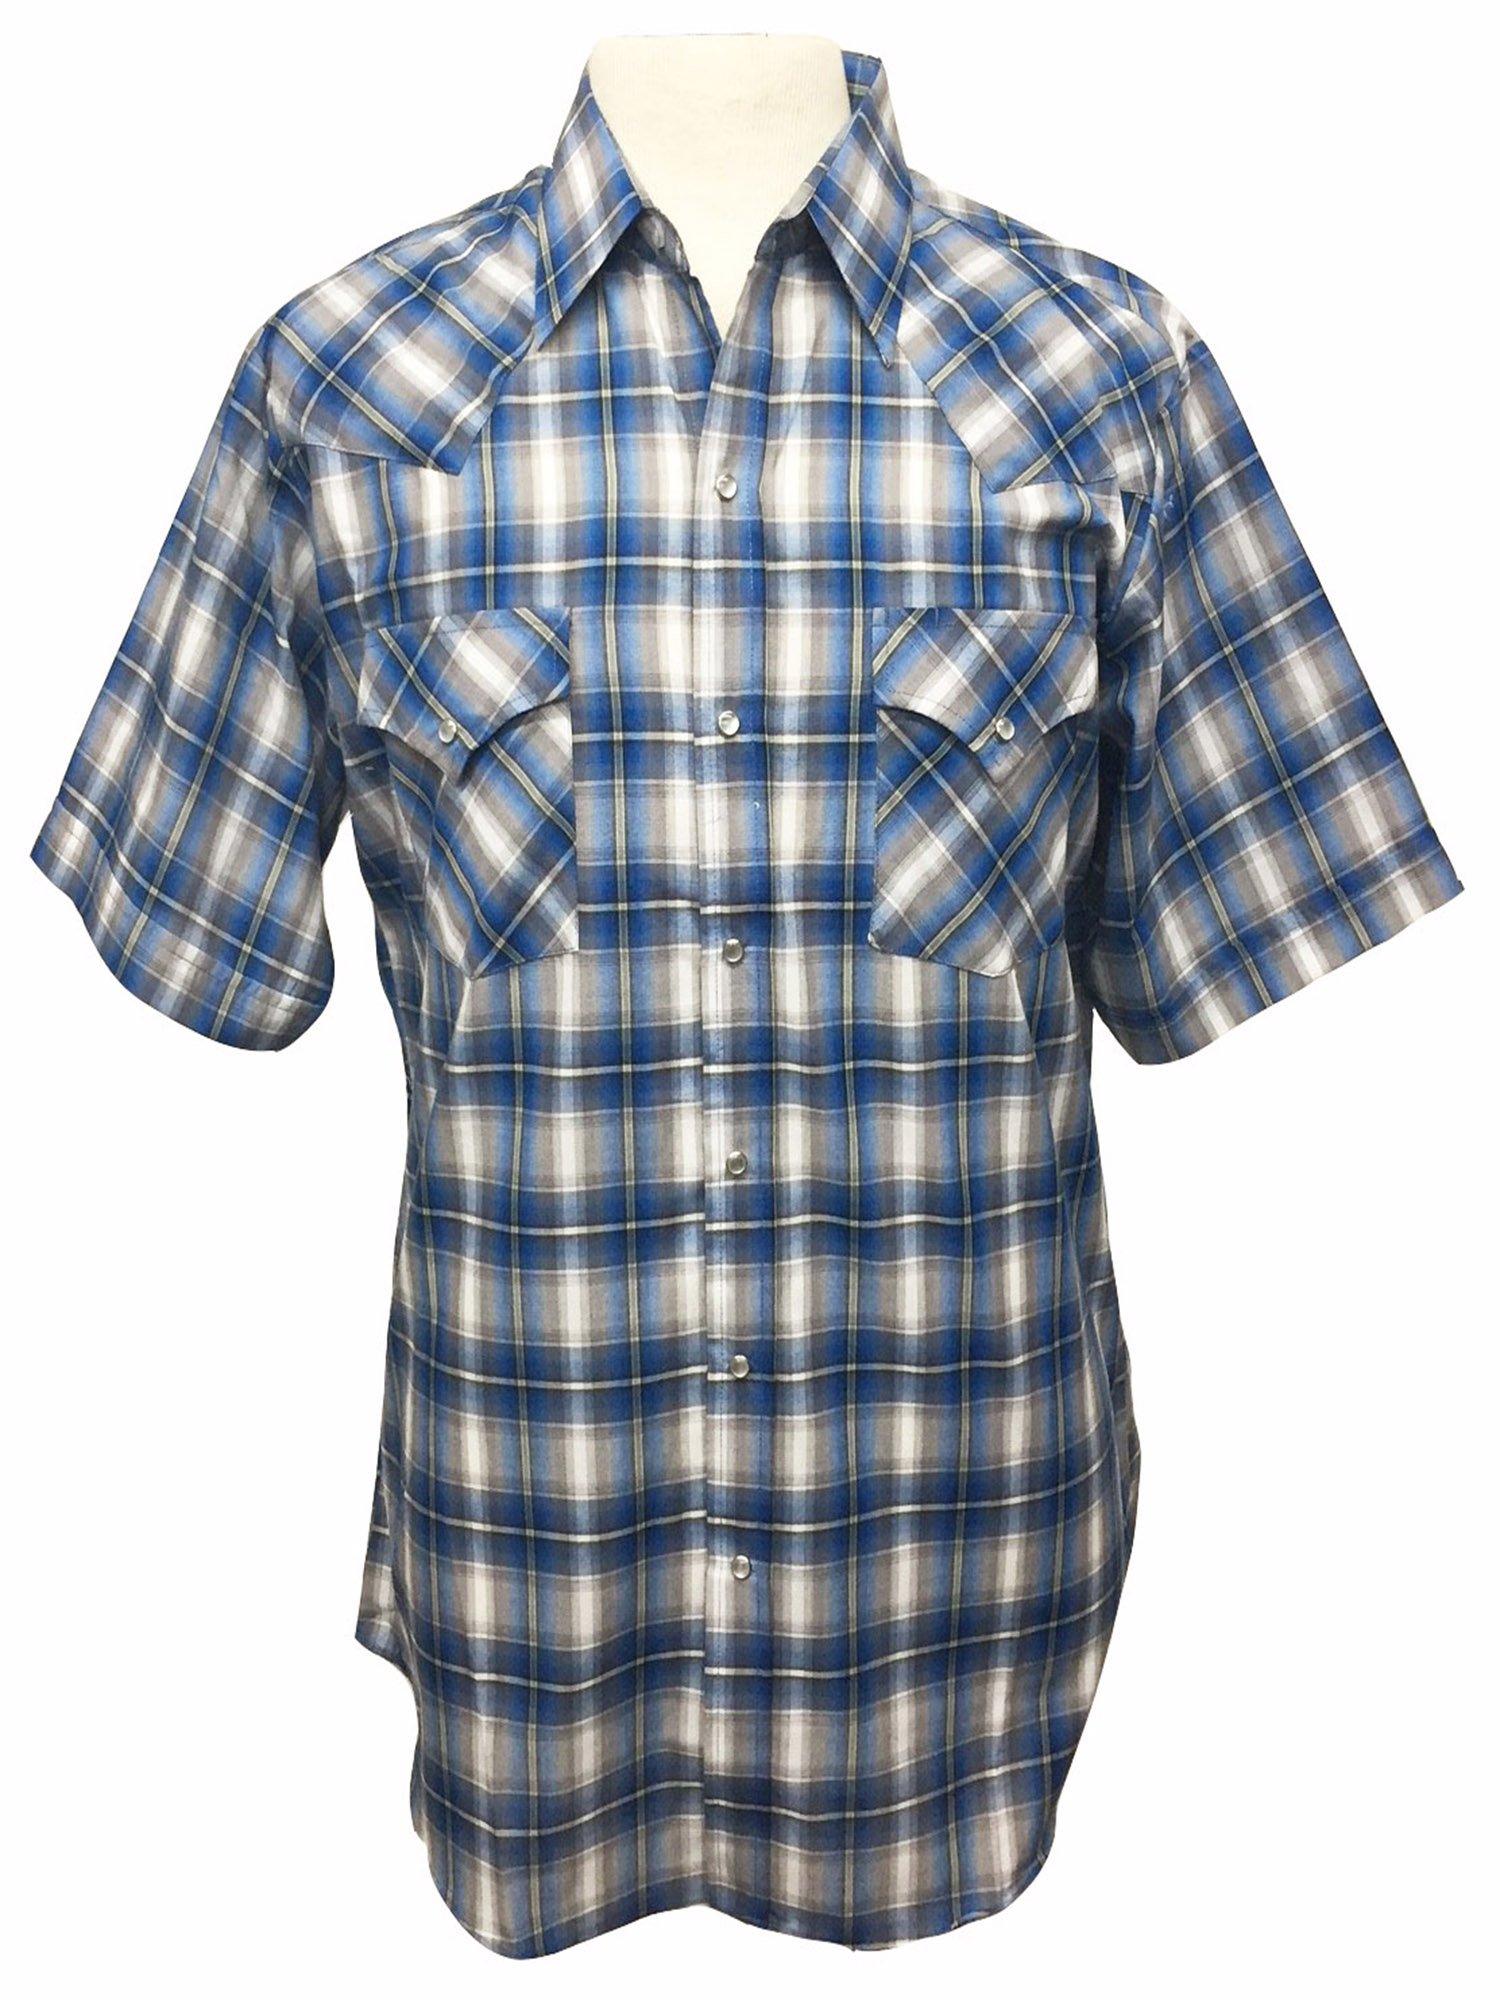 Ely Cattleman Short Sleeve Mens Plaid Snap Western Cowboy Style Shirt - Blue